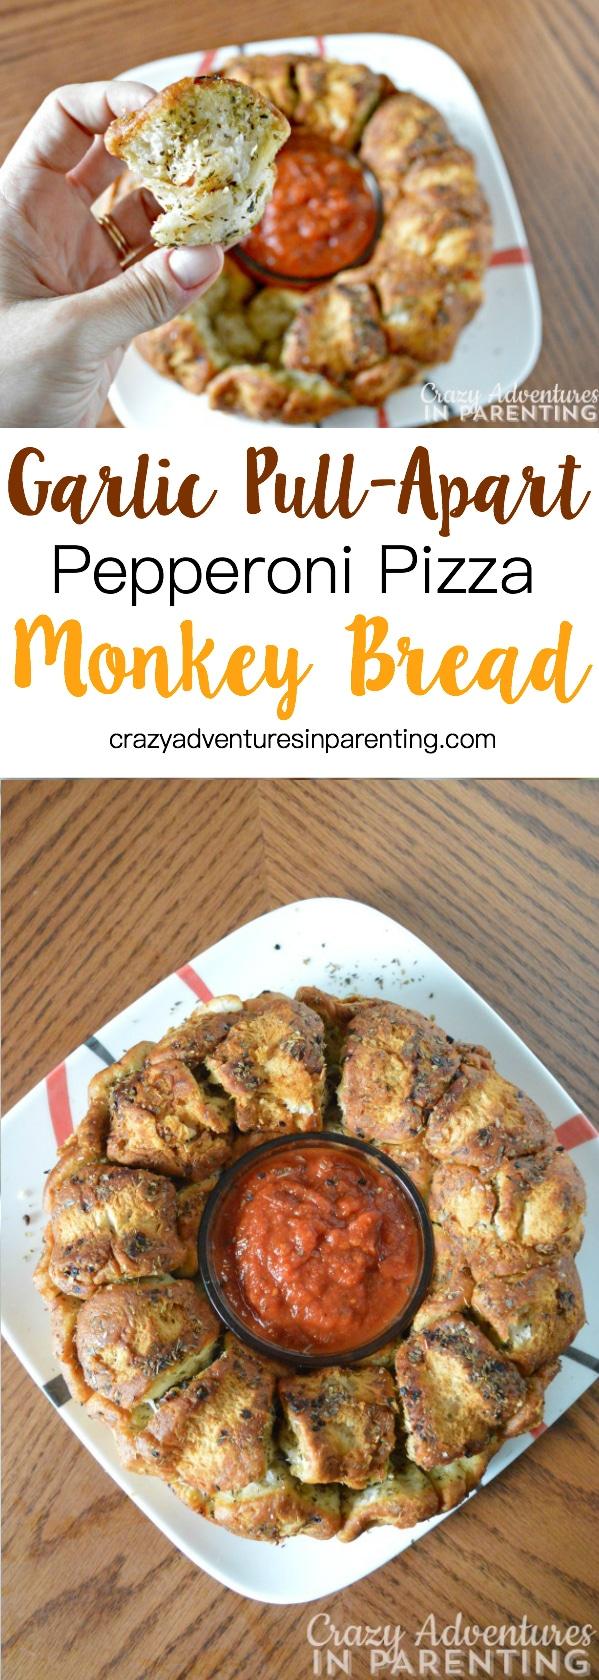 Easy Garlic Pull-Apart Pepperoni Pizza Monkey Bread